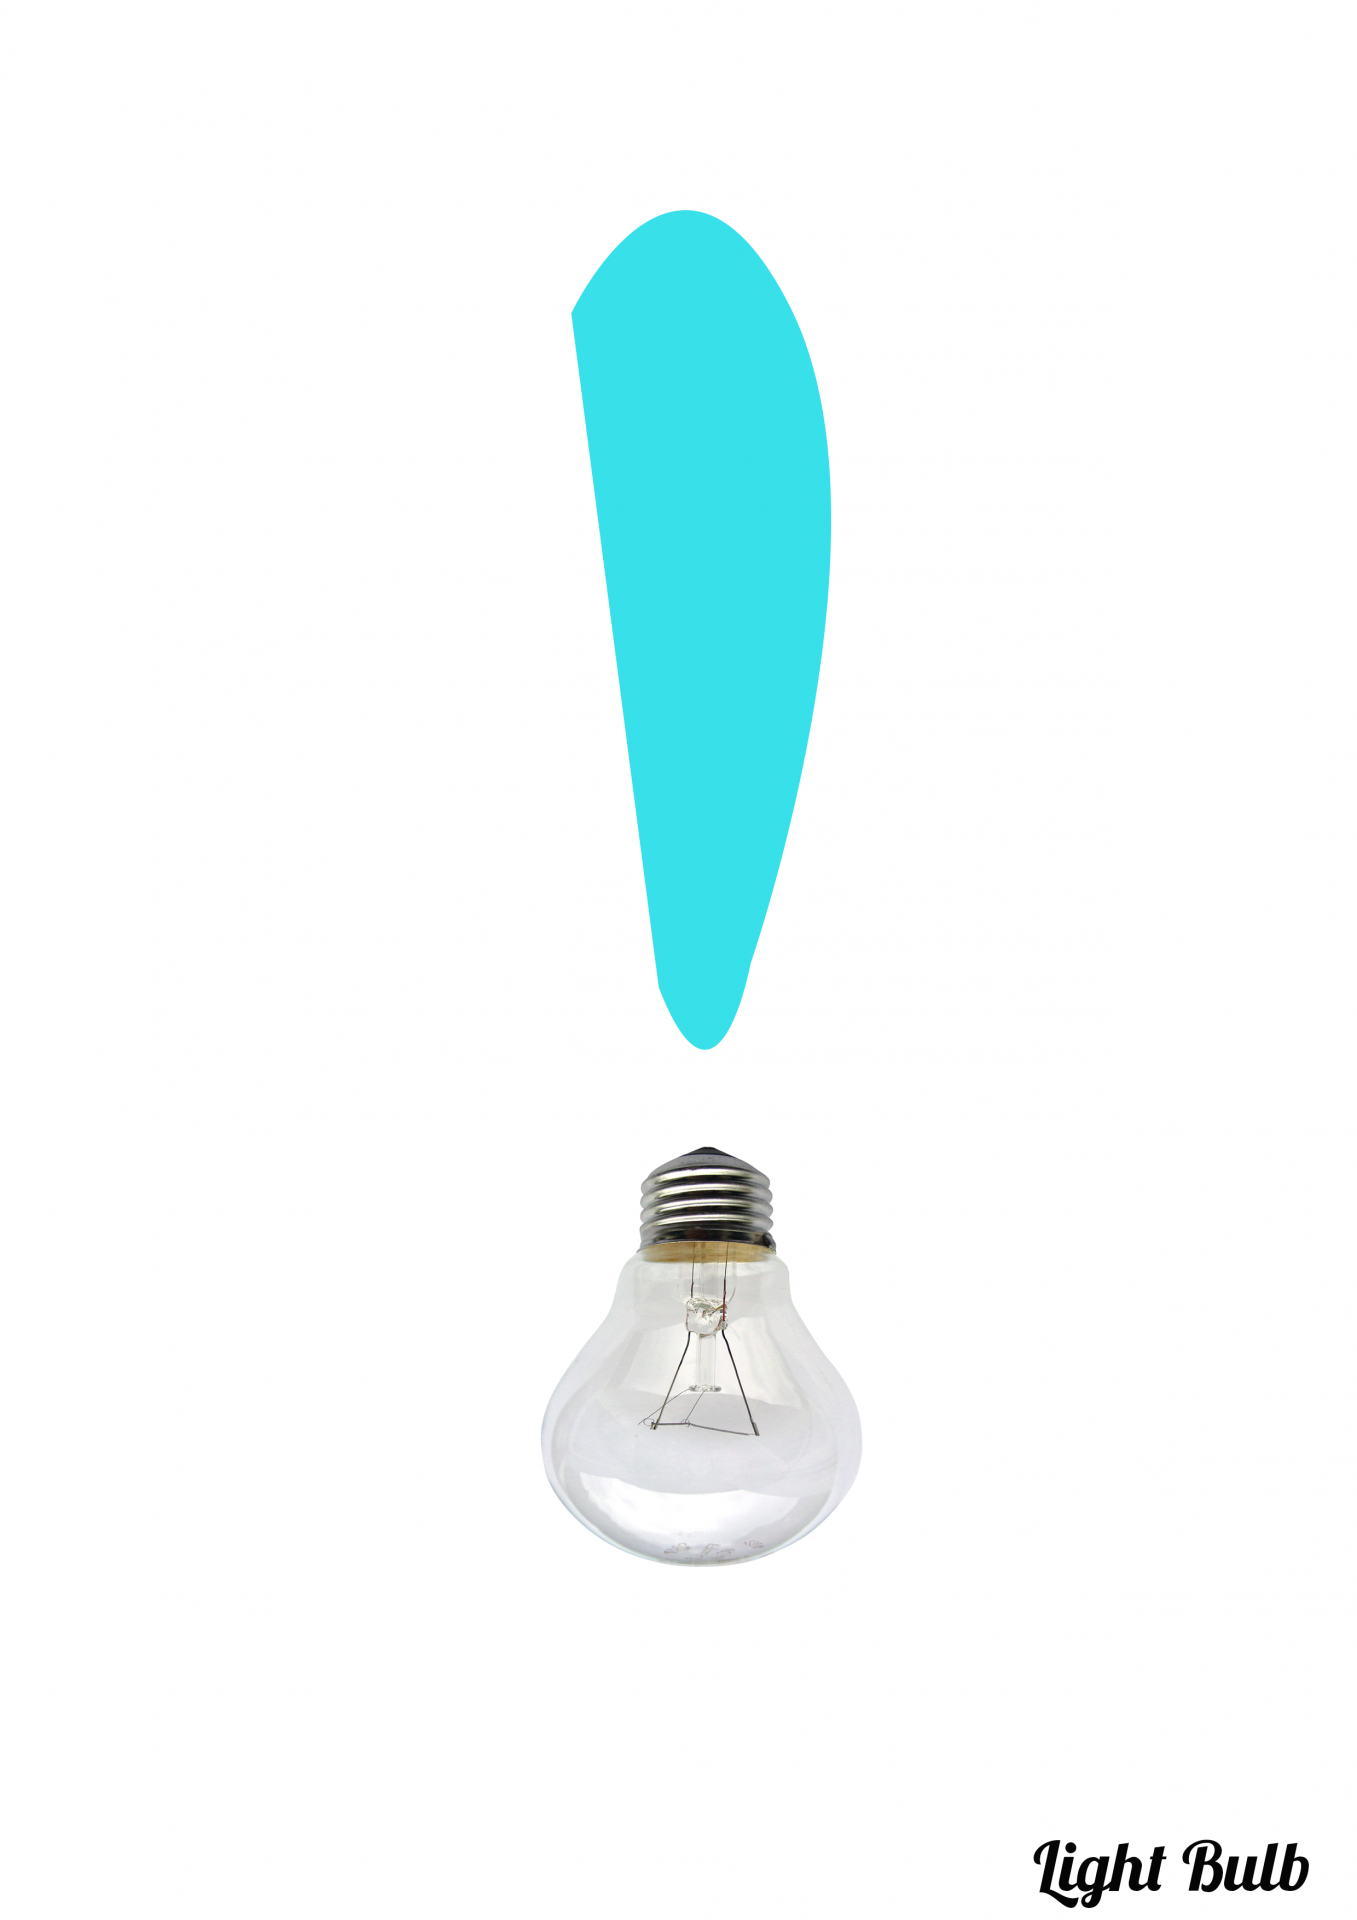 College Dorm Room Ideas Led Lights